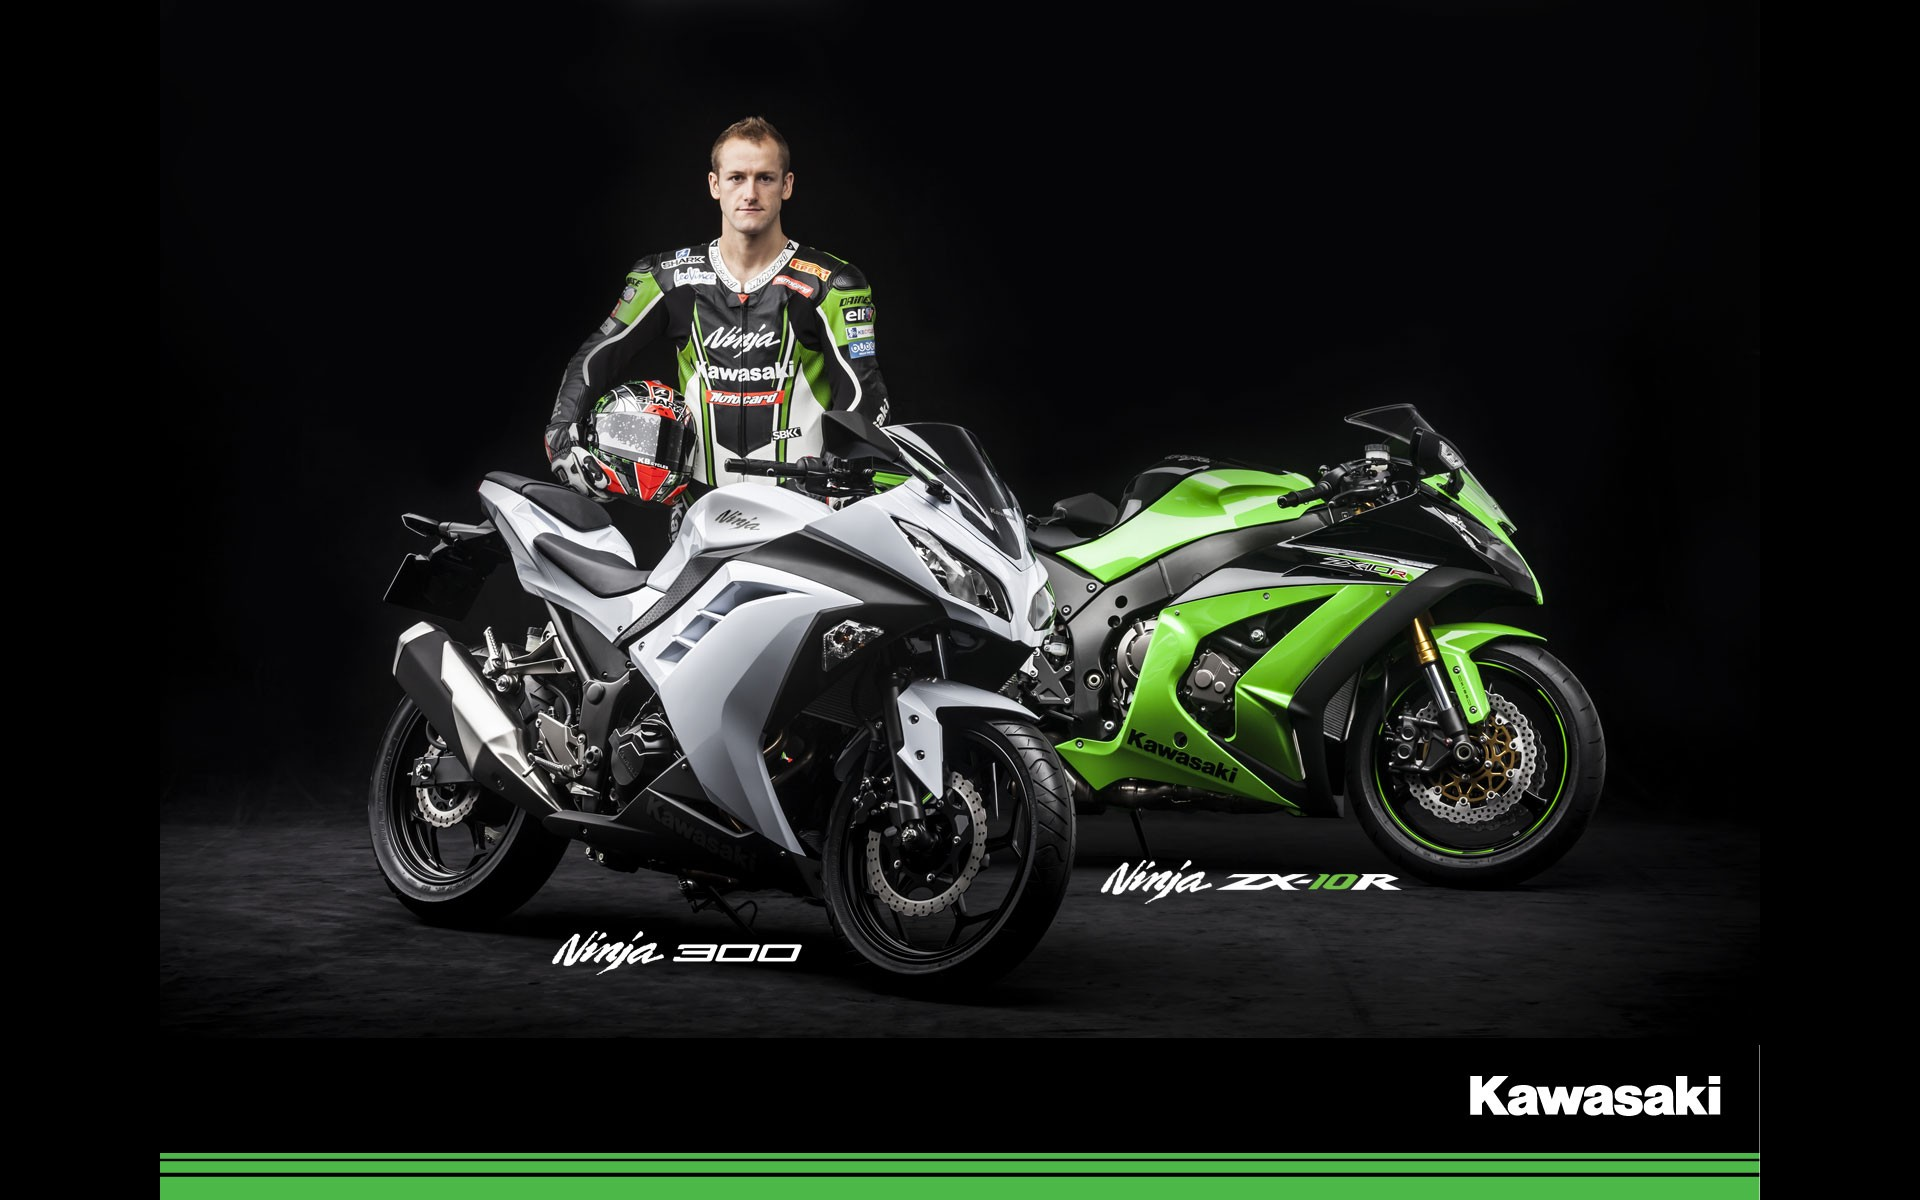 High resolution Kawasaki wallpaper | Kawasaki Motors Australia